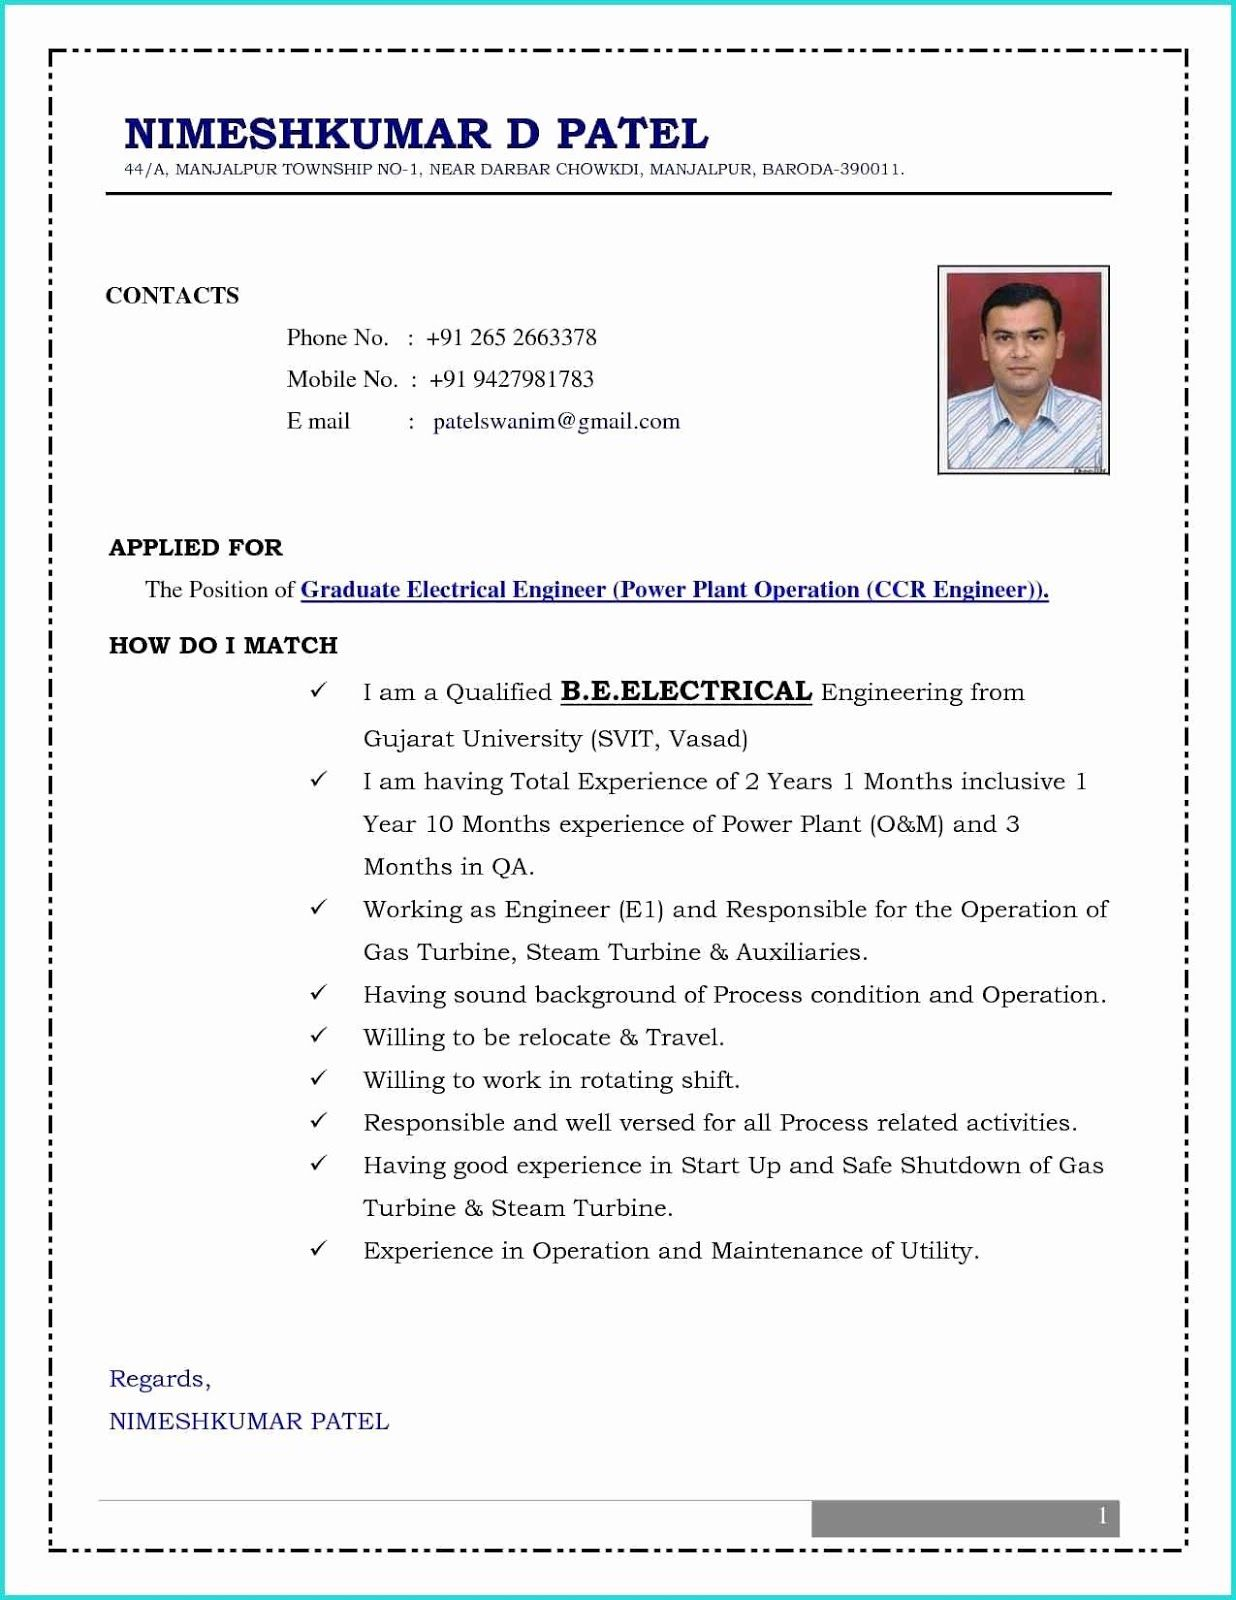 Mechanical Engineering Cv Format Mechanical Engineering Cv Format For Fresher Pdf Mechanical Eng Best Resume Format Sample Resume Format Best Resume Template